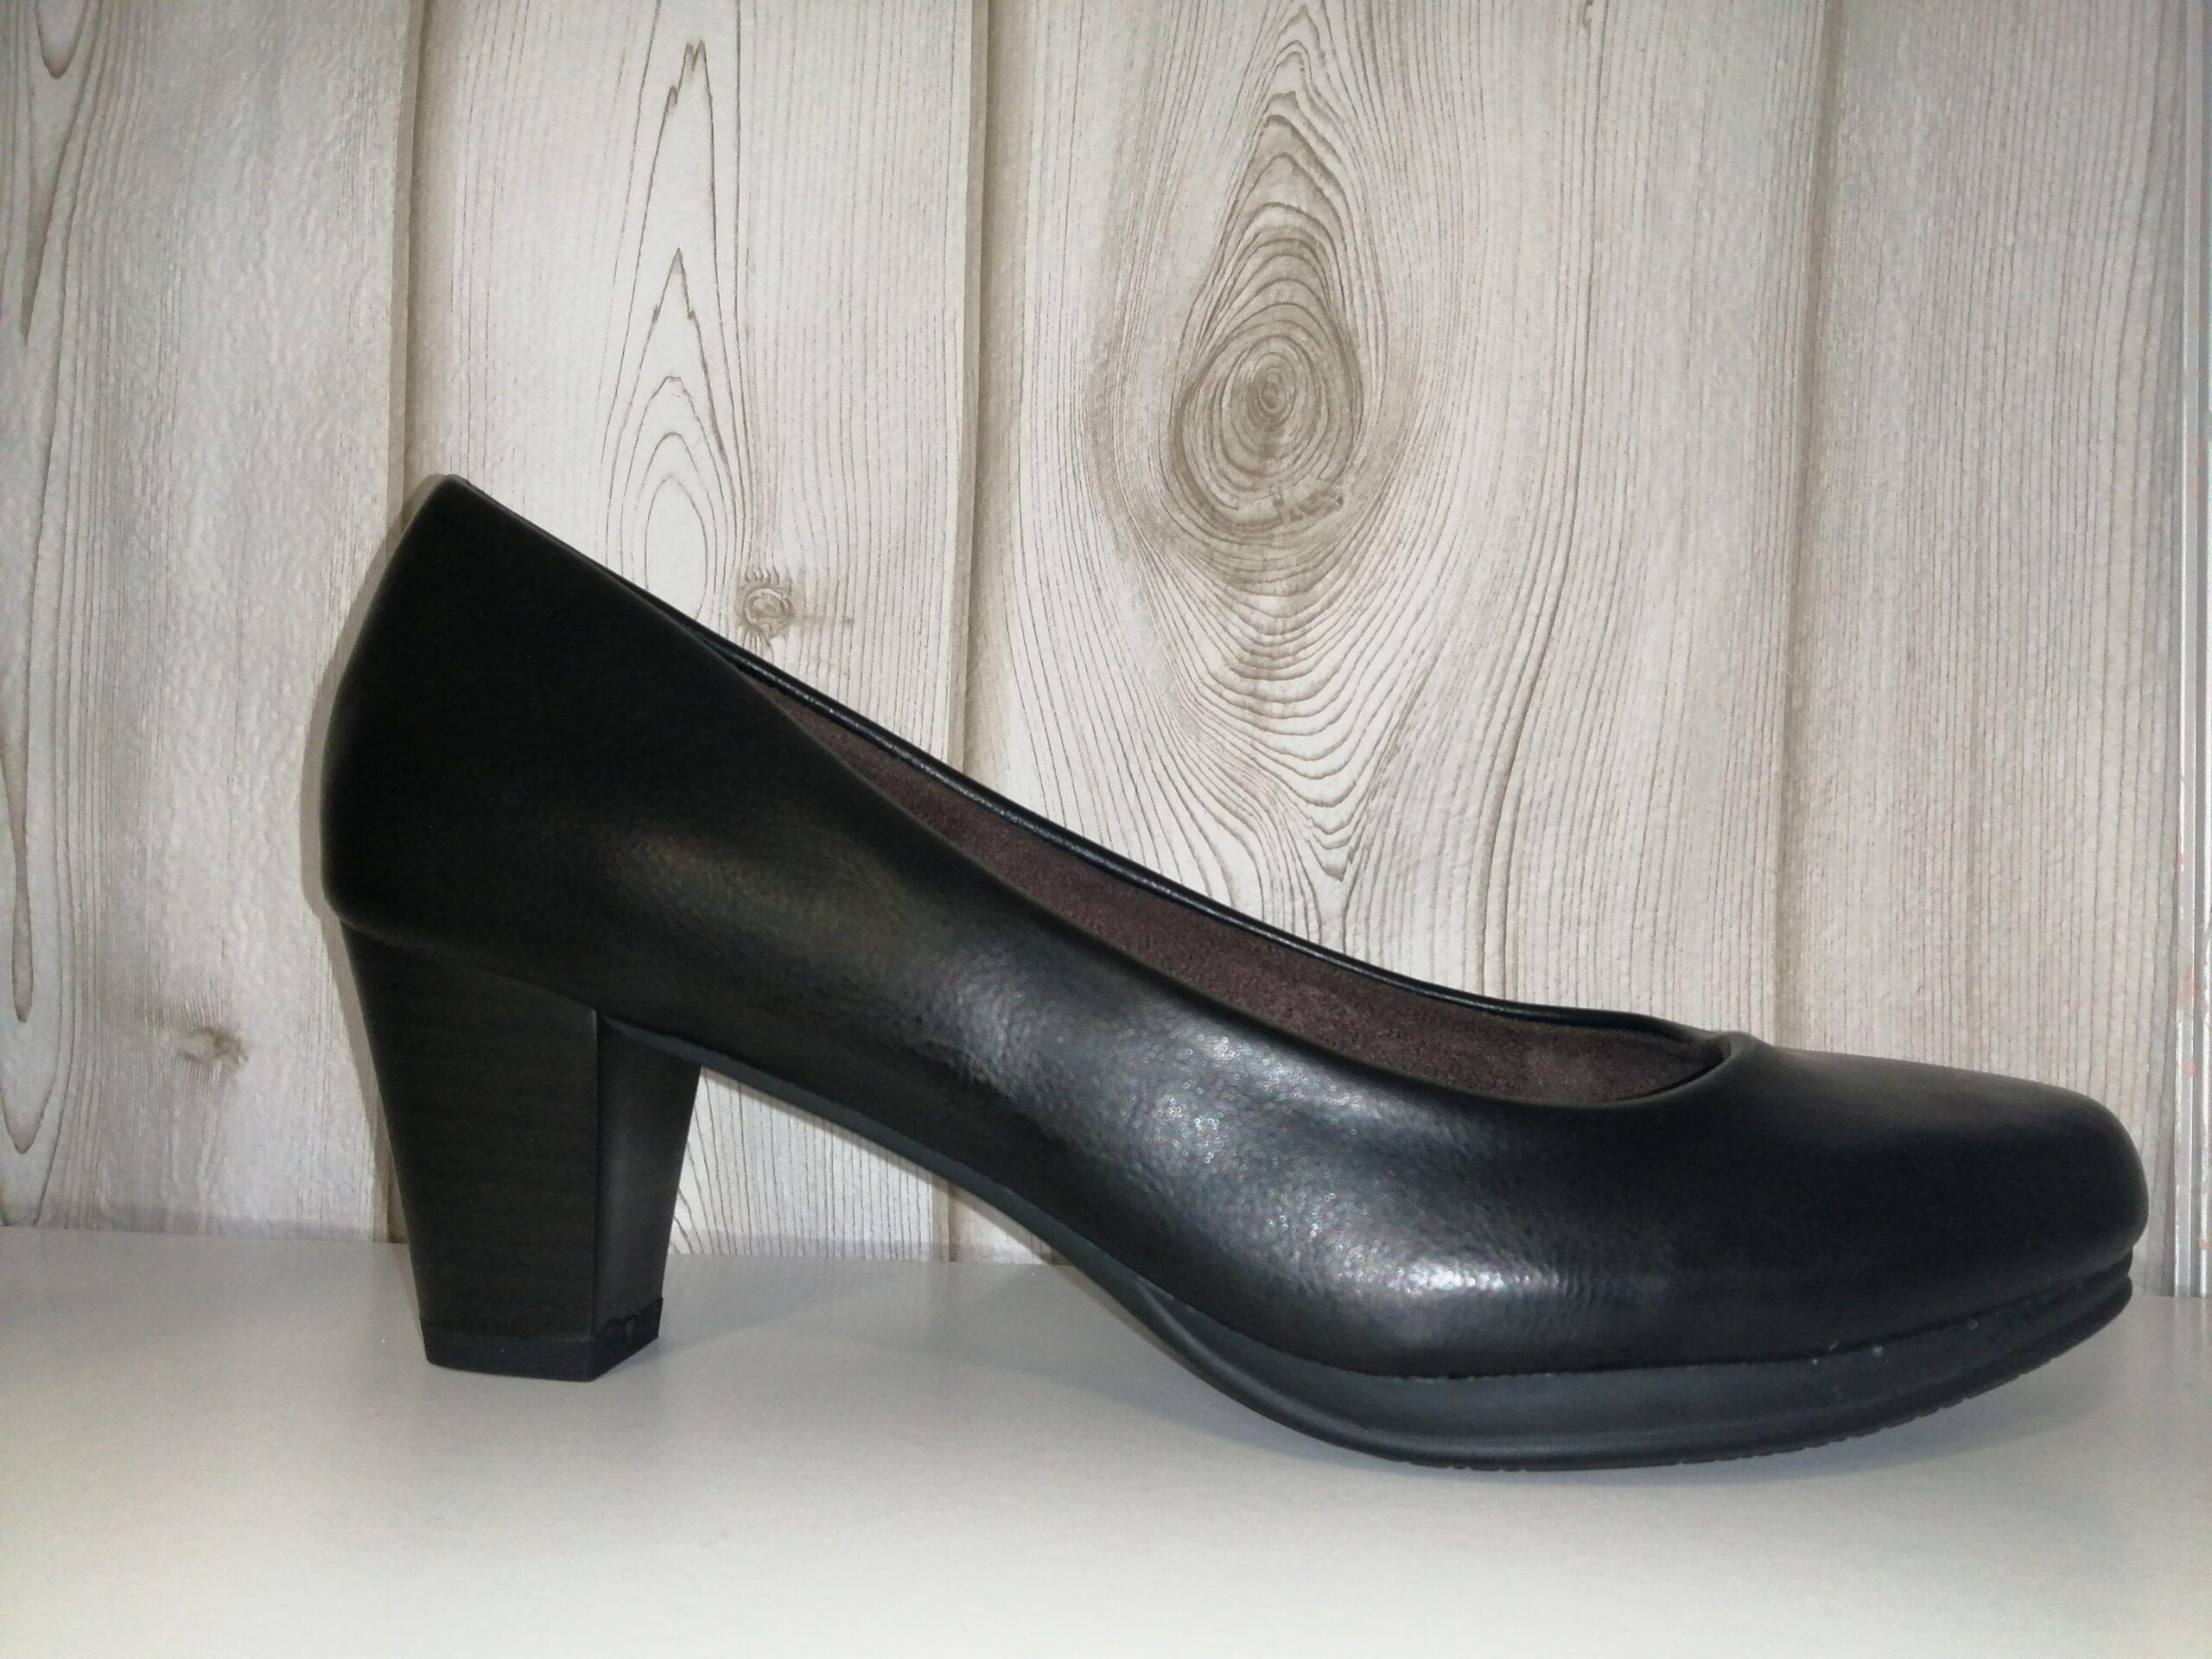 Zapato sra piel   salón negro BL1793-1